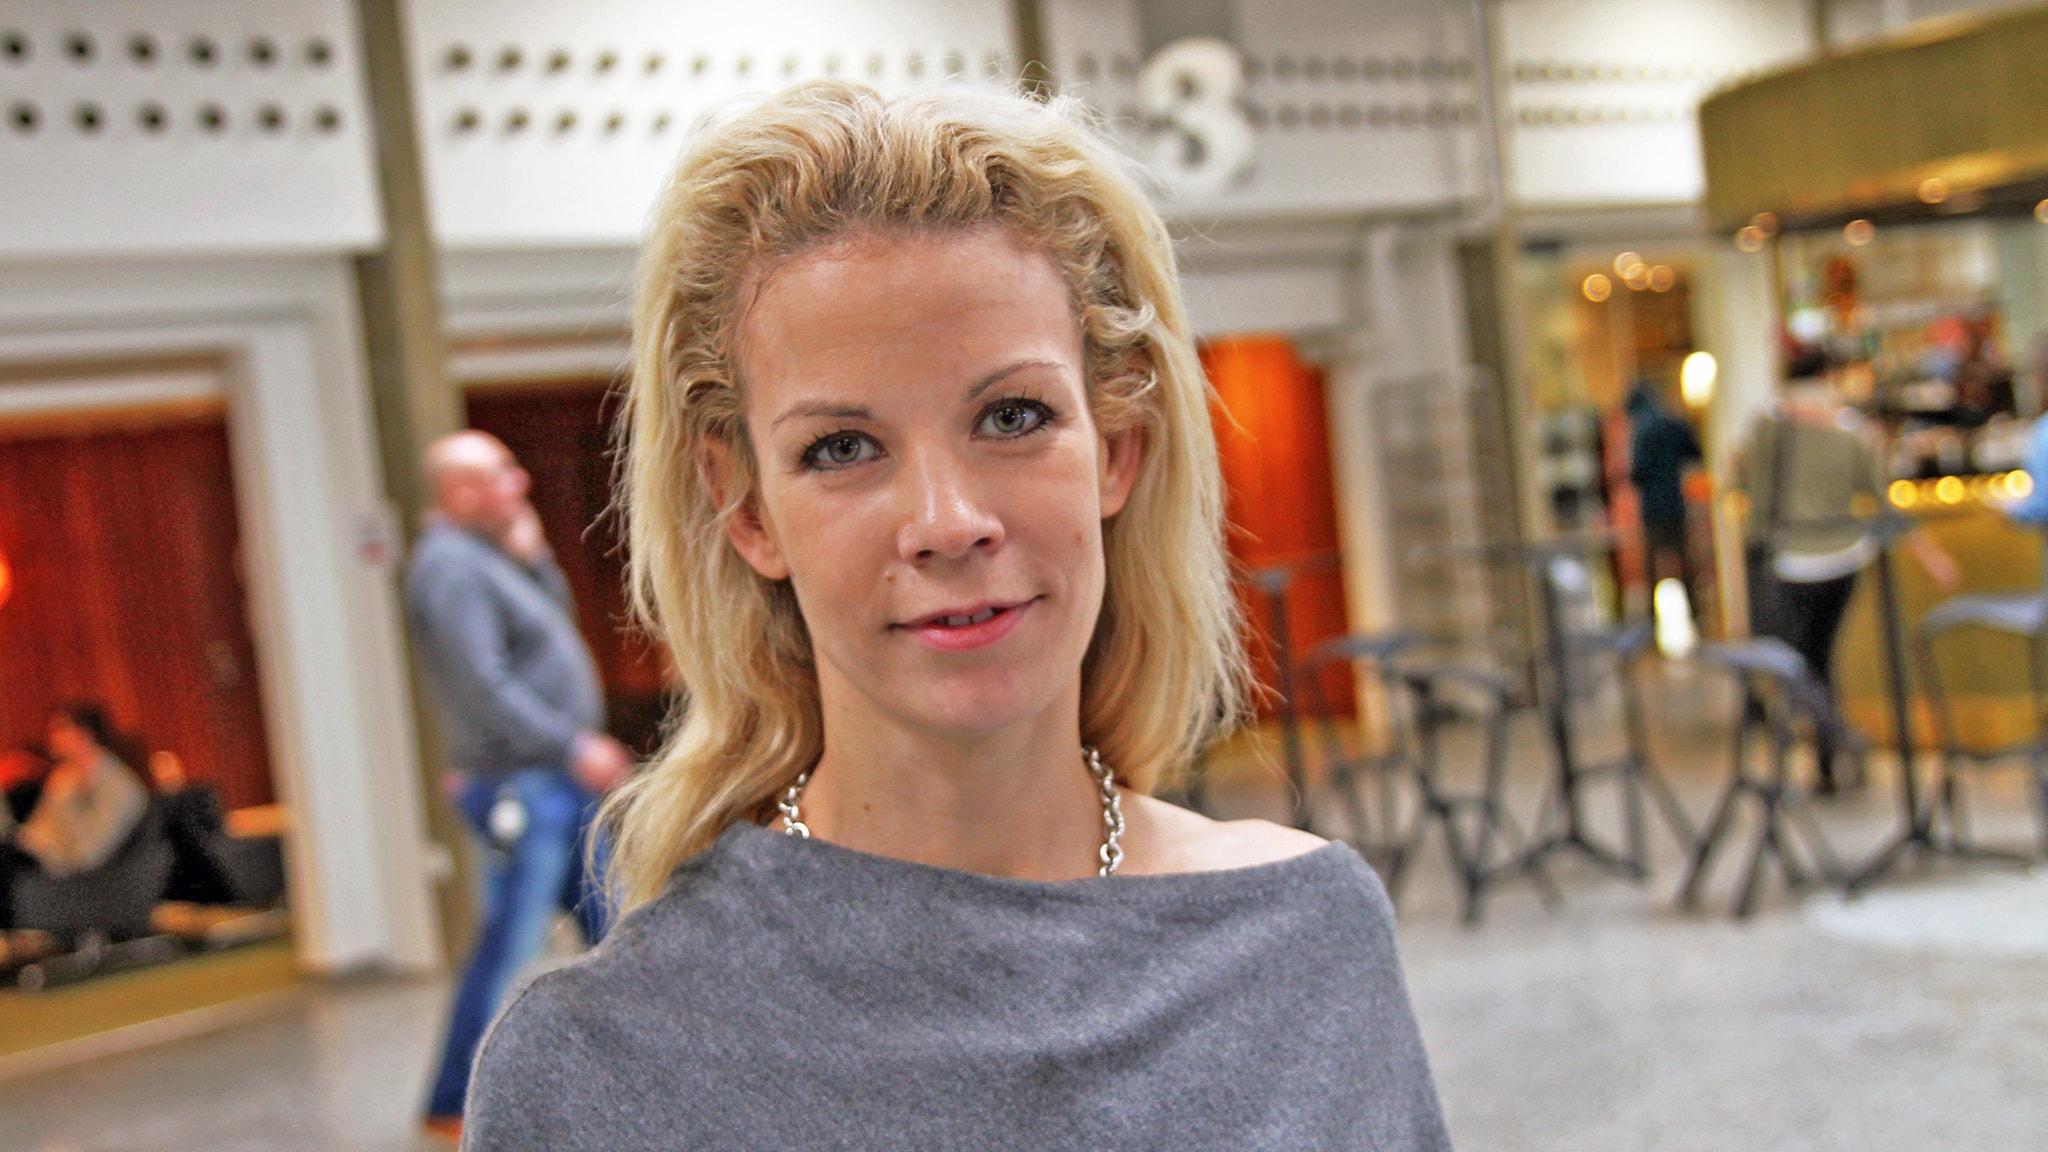 Anna Konig Nude Photos 45